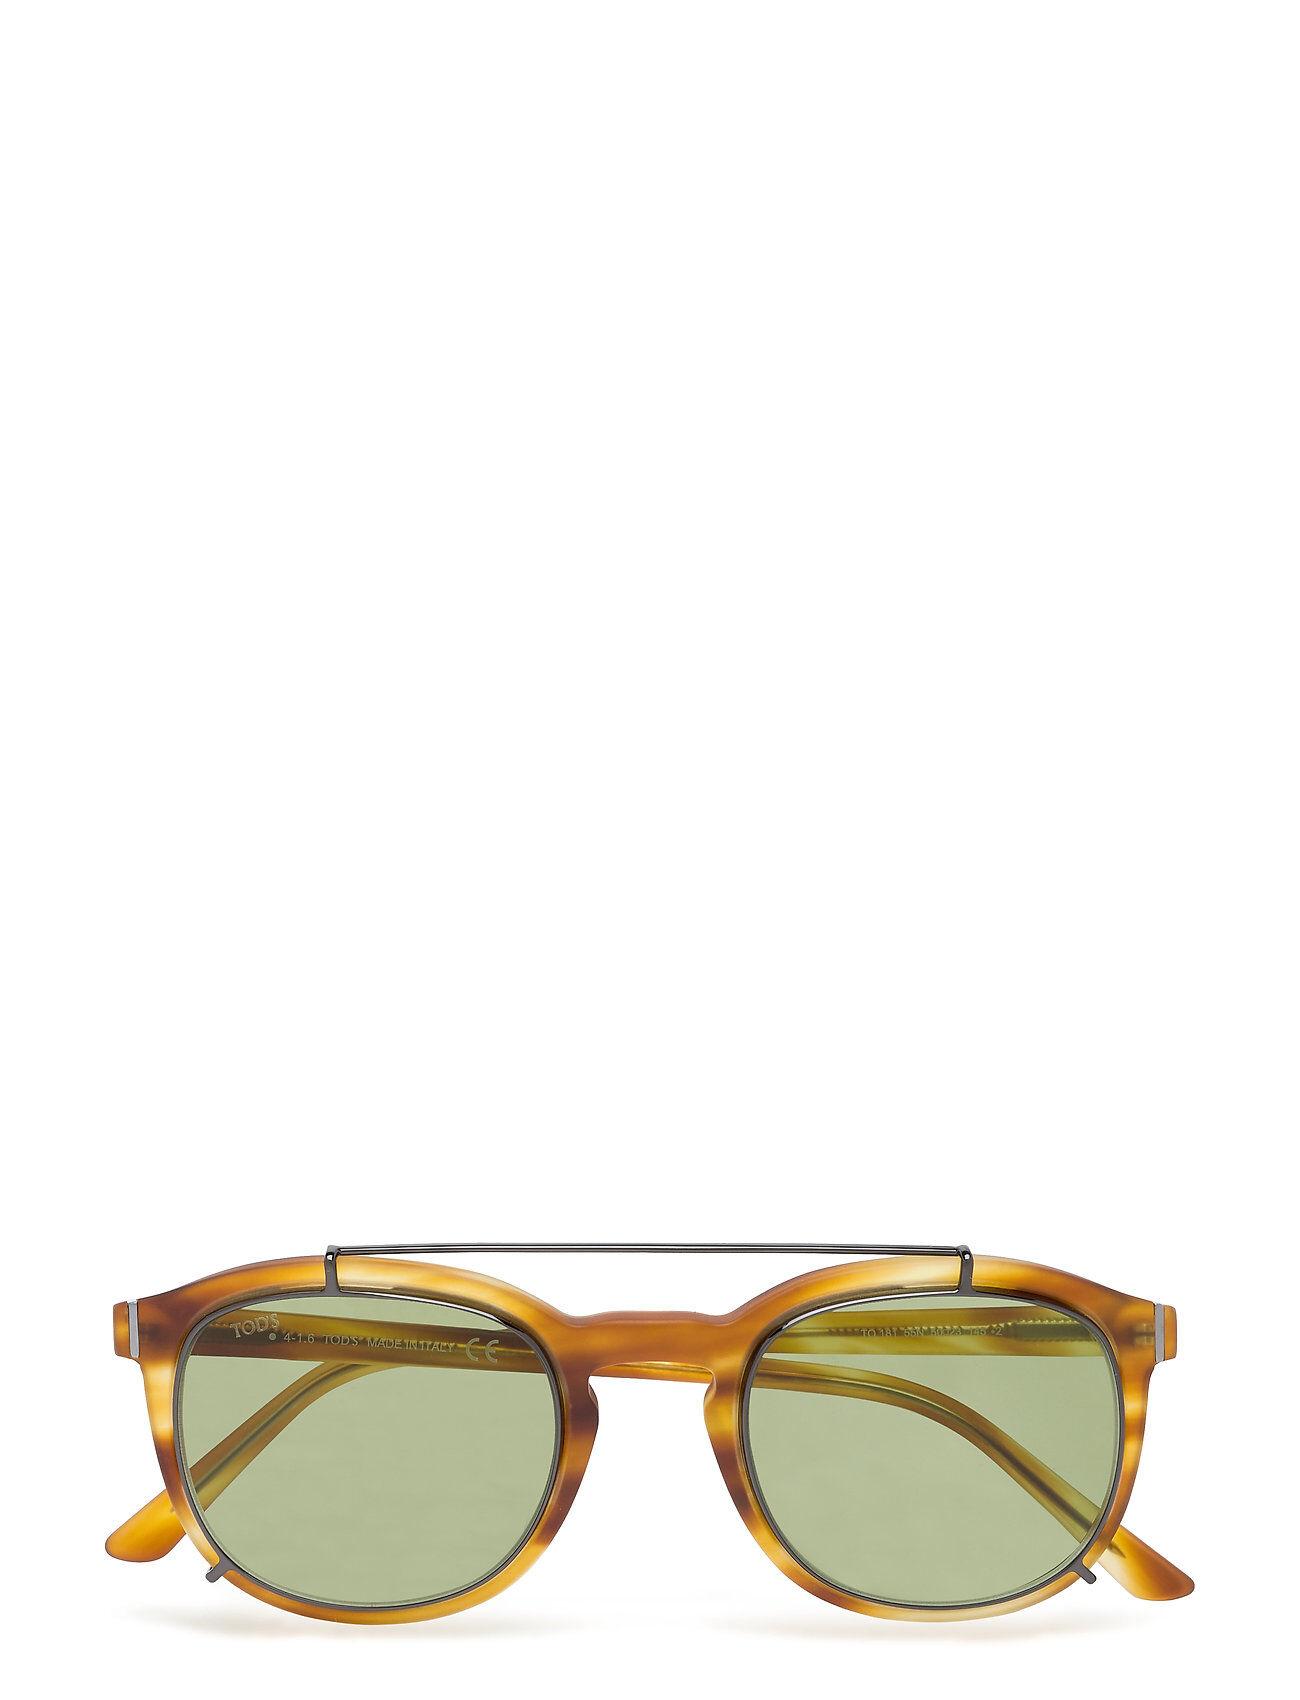 Image of TODS Sunglasses To0181 Wayfarer Aurinkolasit Ruskea TODS Sunglasses